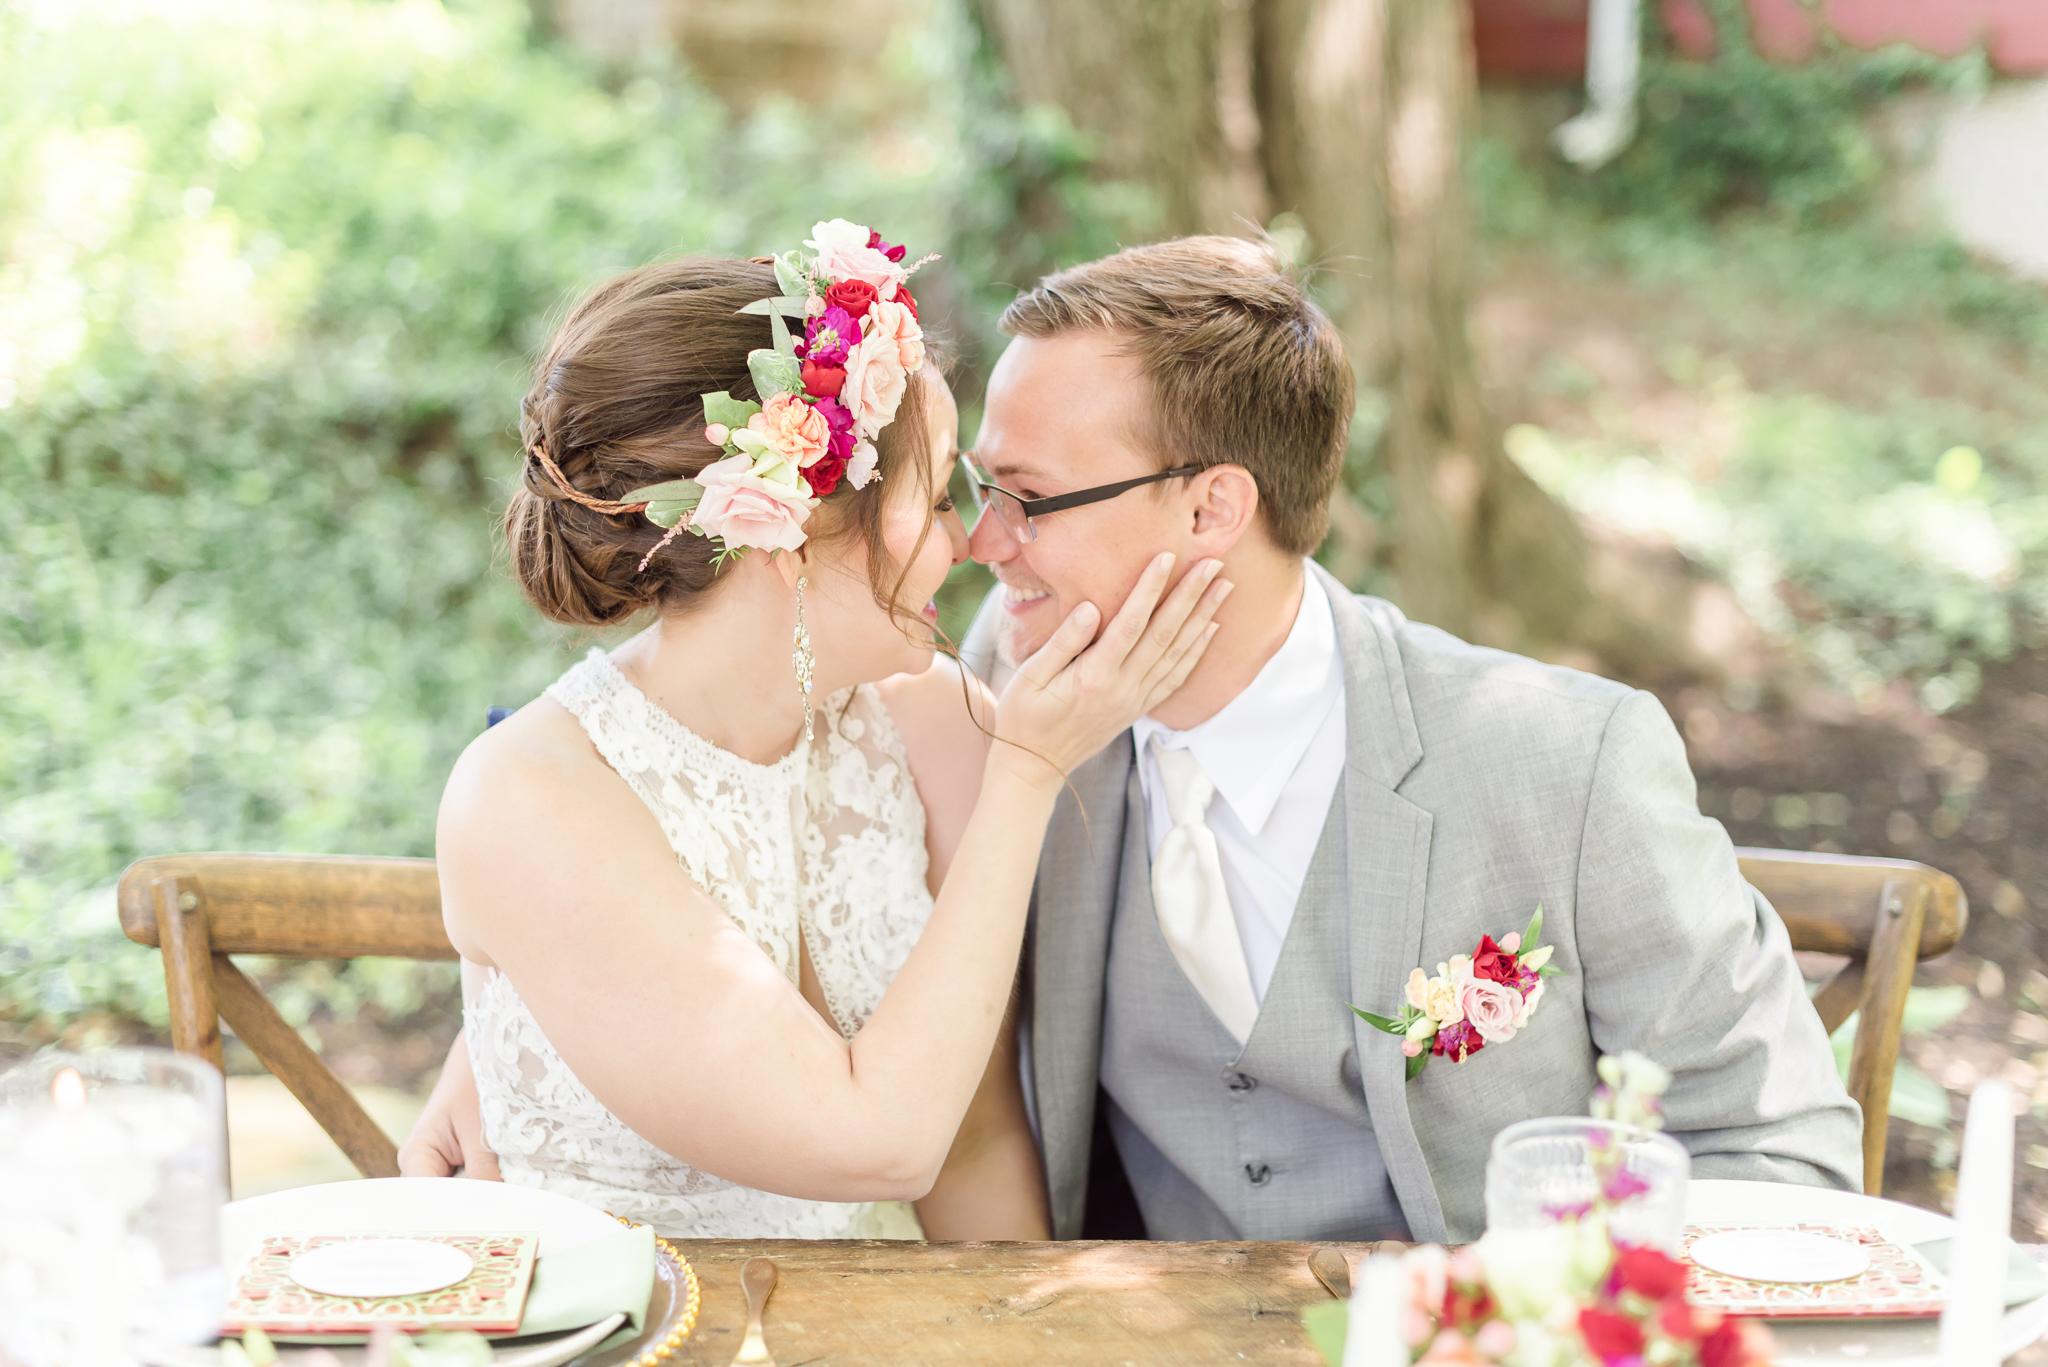 Mustard Seed Gardens Wedding Indianapolis Noblesvile Fishers Wedding Photographer-64.jpg